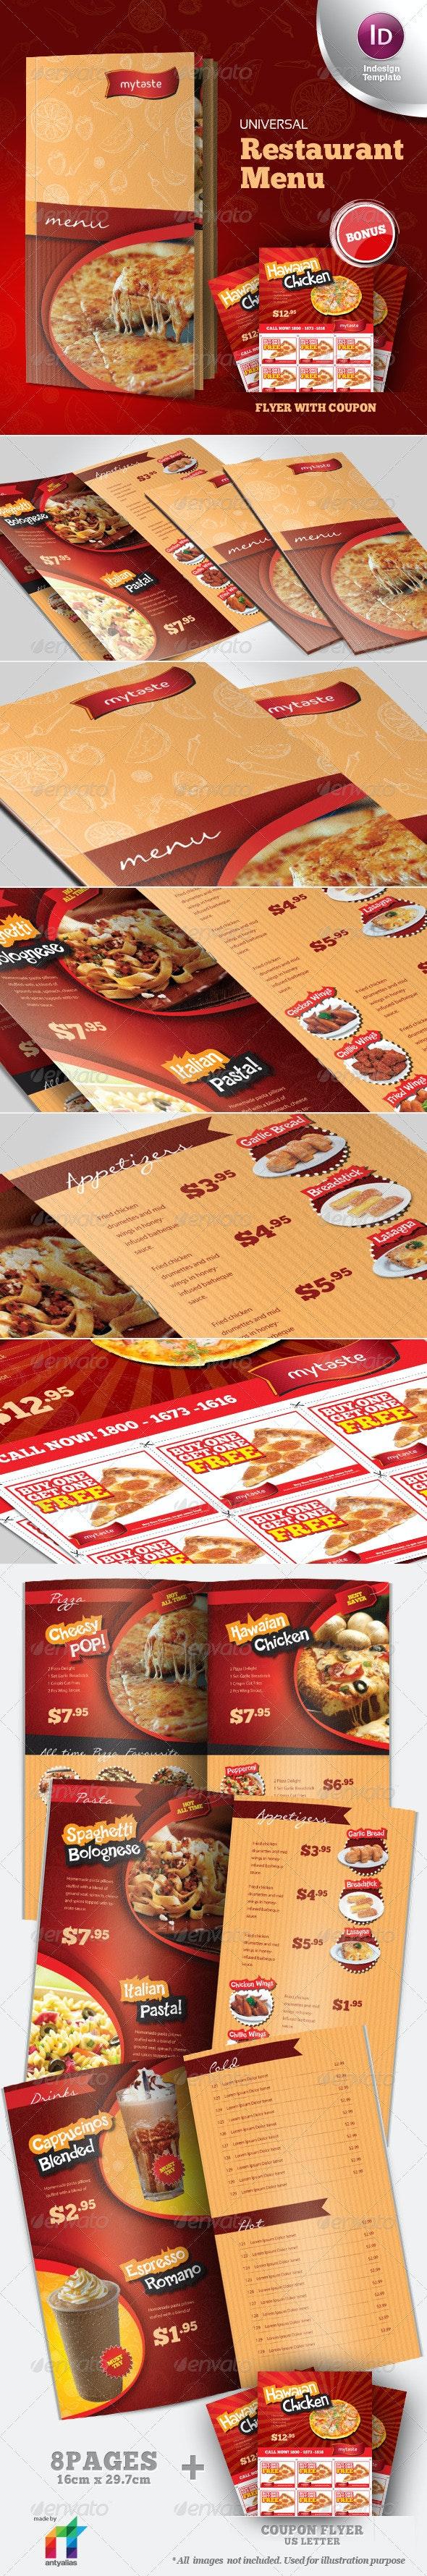 Universal Restaurant Menu Indesign Template - Food Menus Print Templates